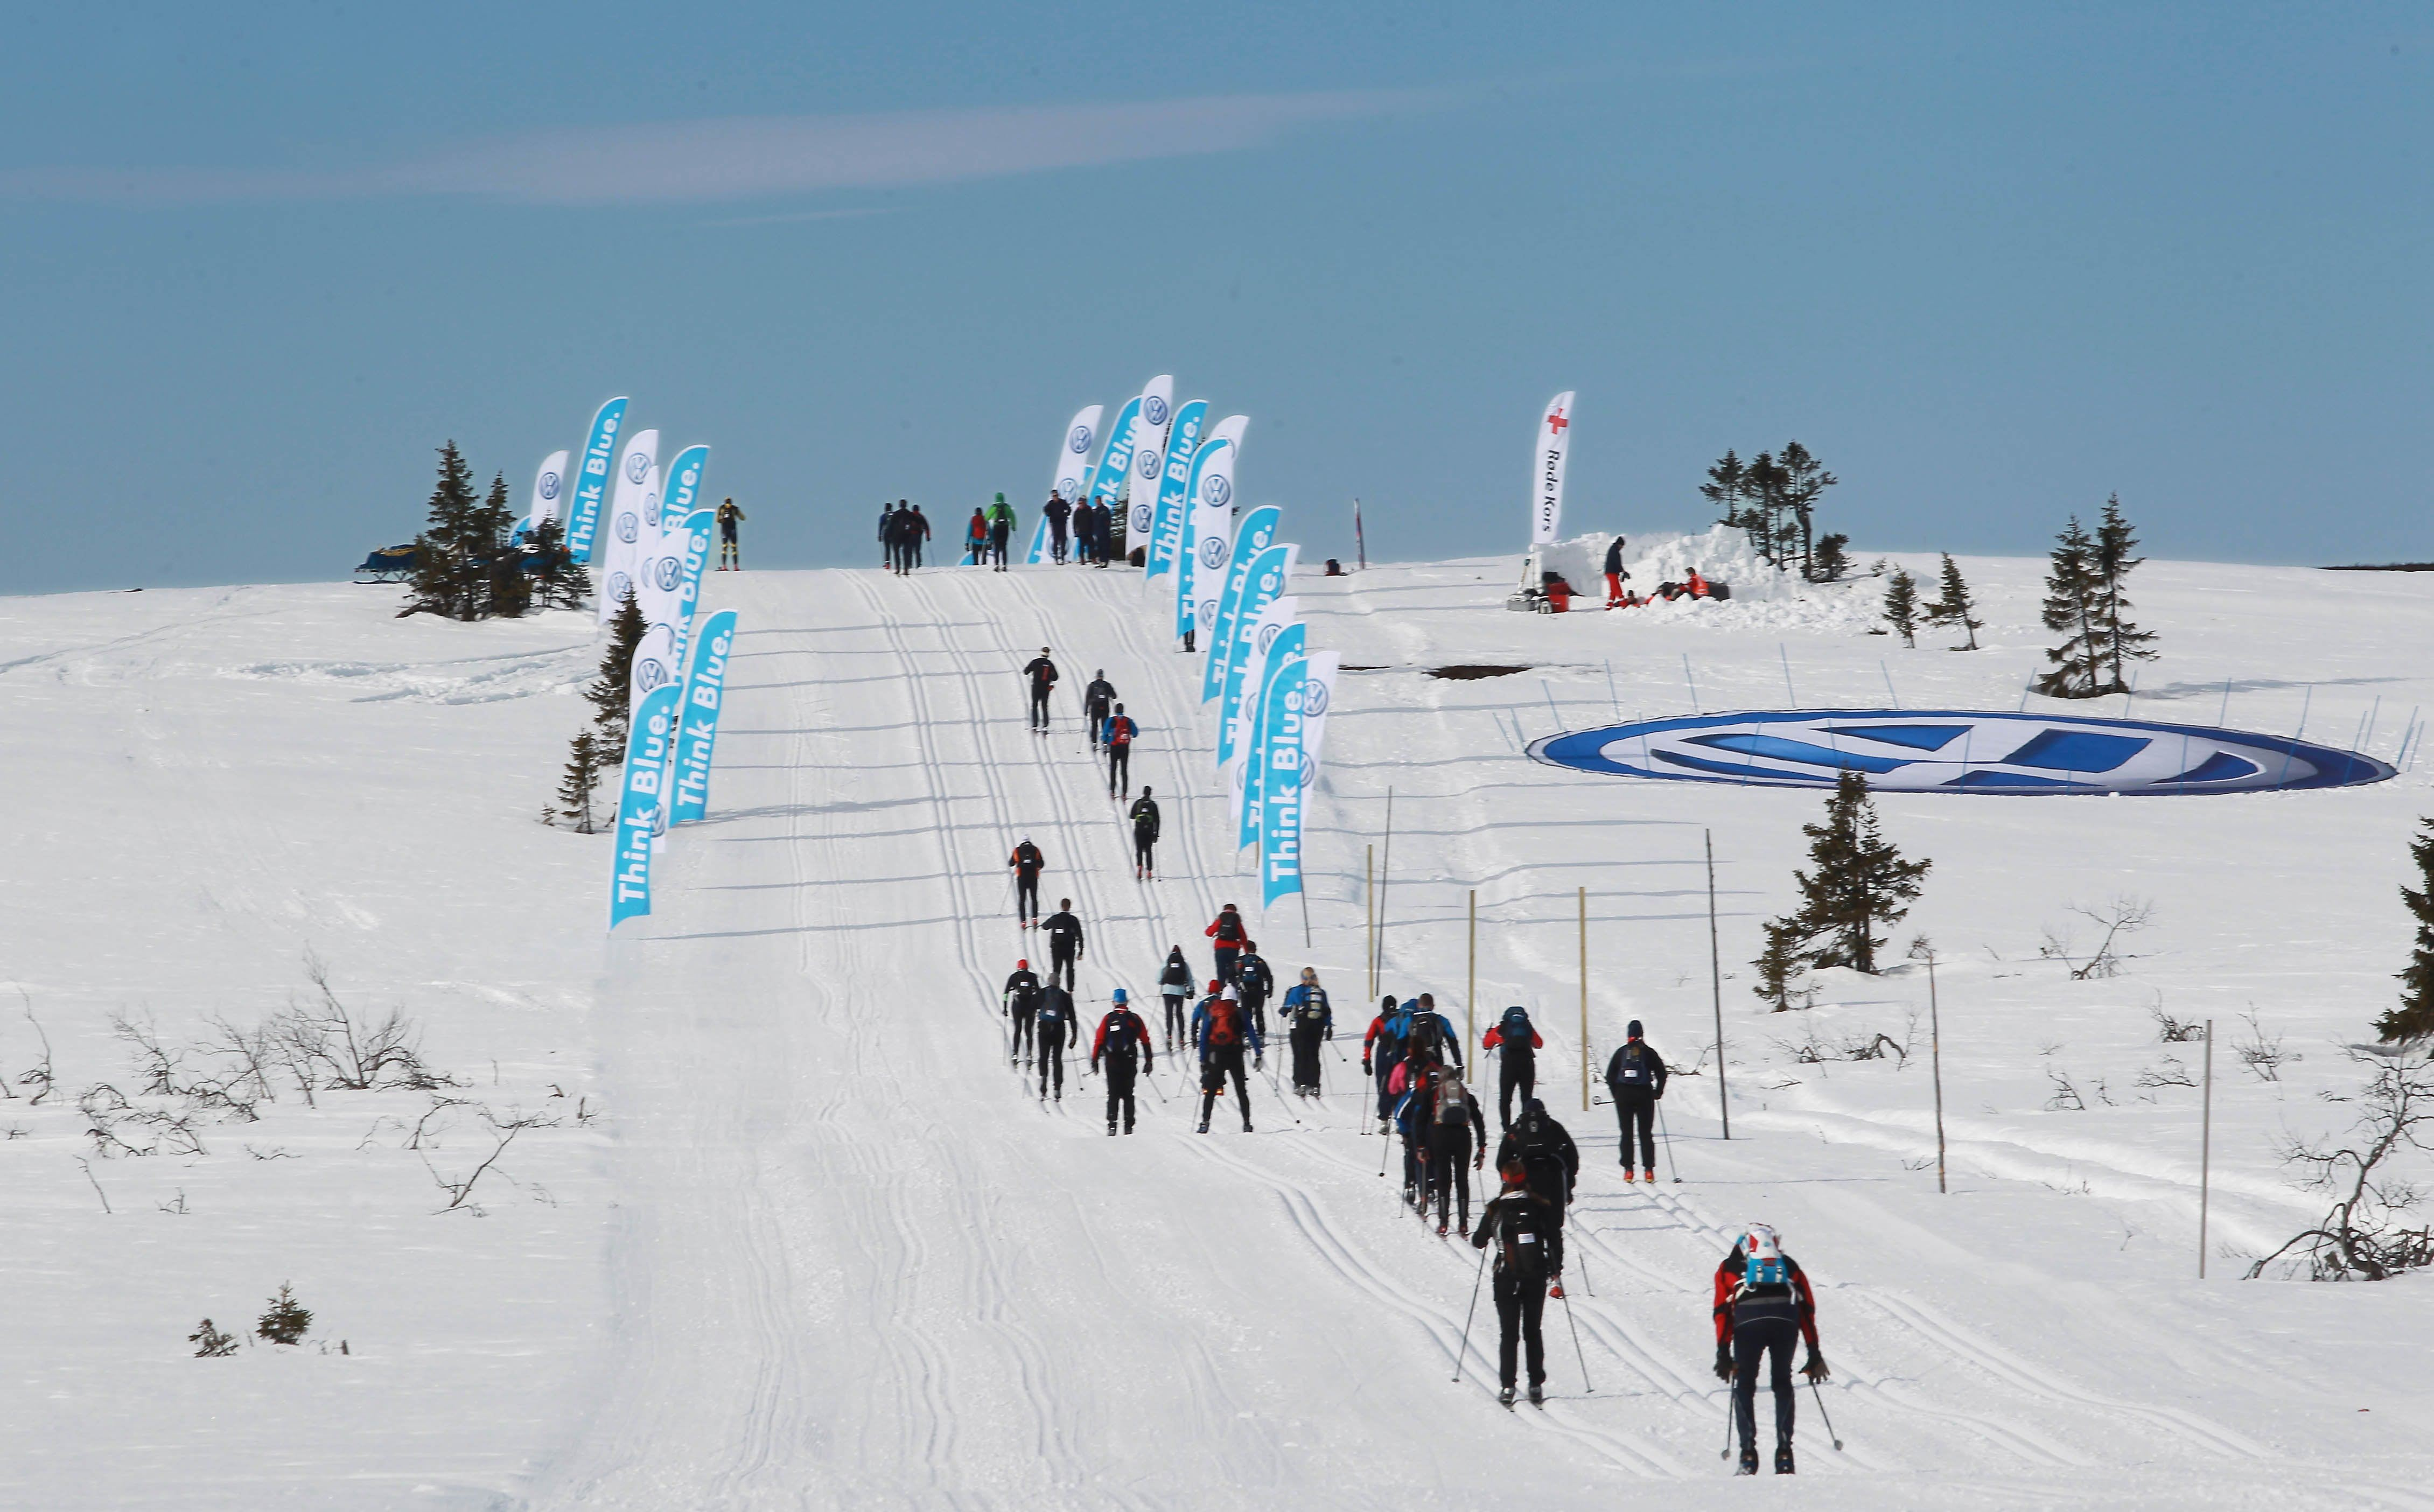 Birkebeiner ski race